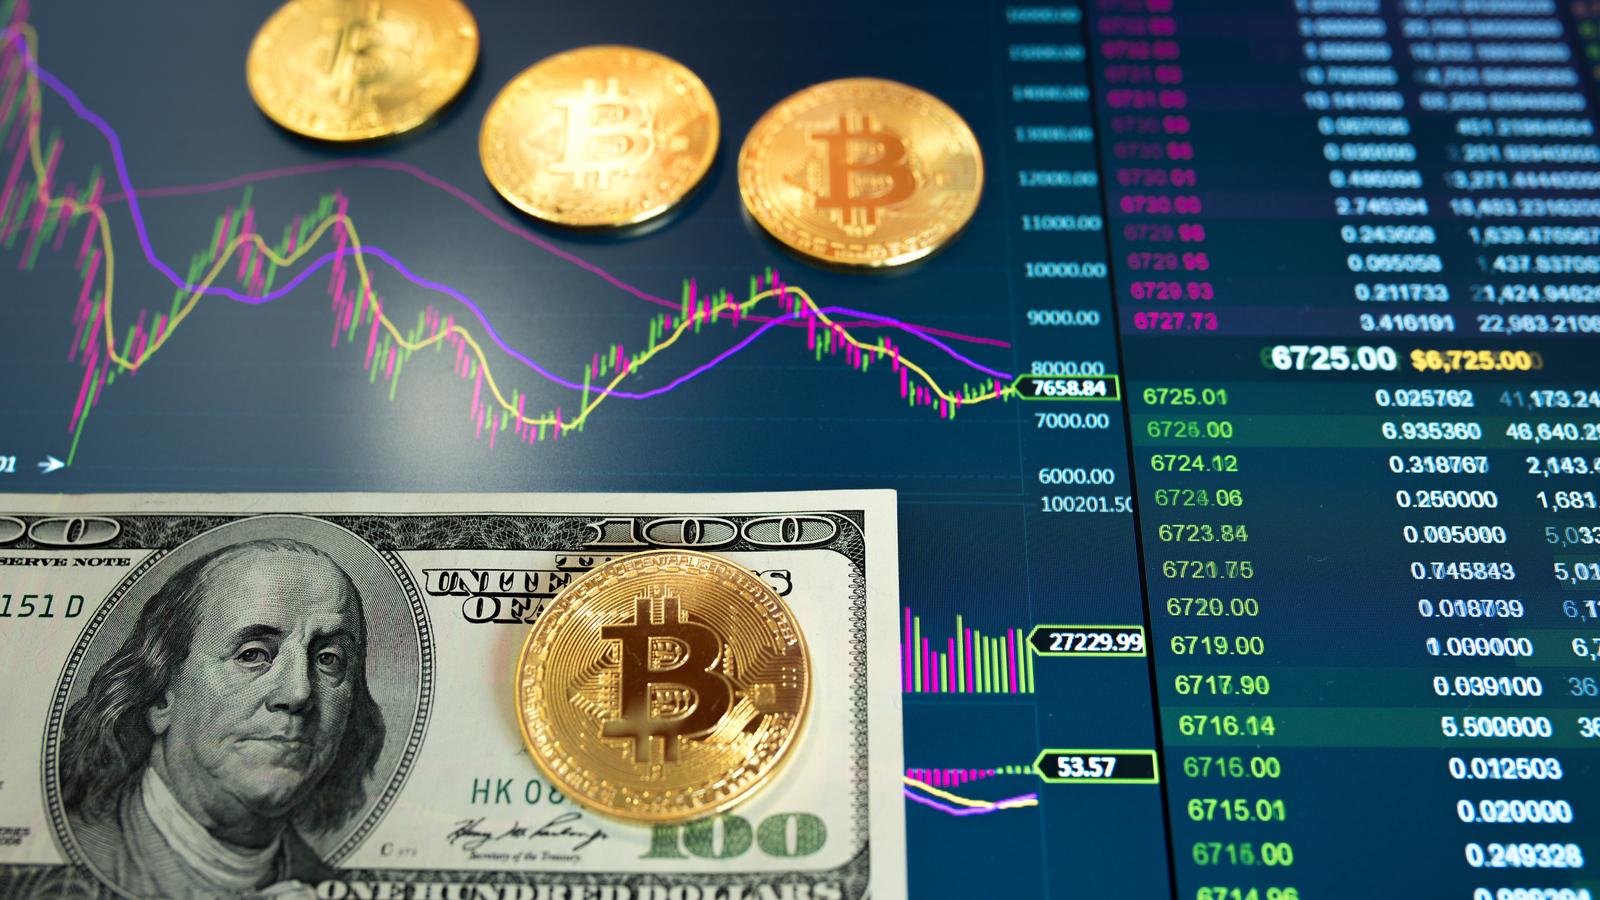 bitcoin global trading volume)